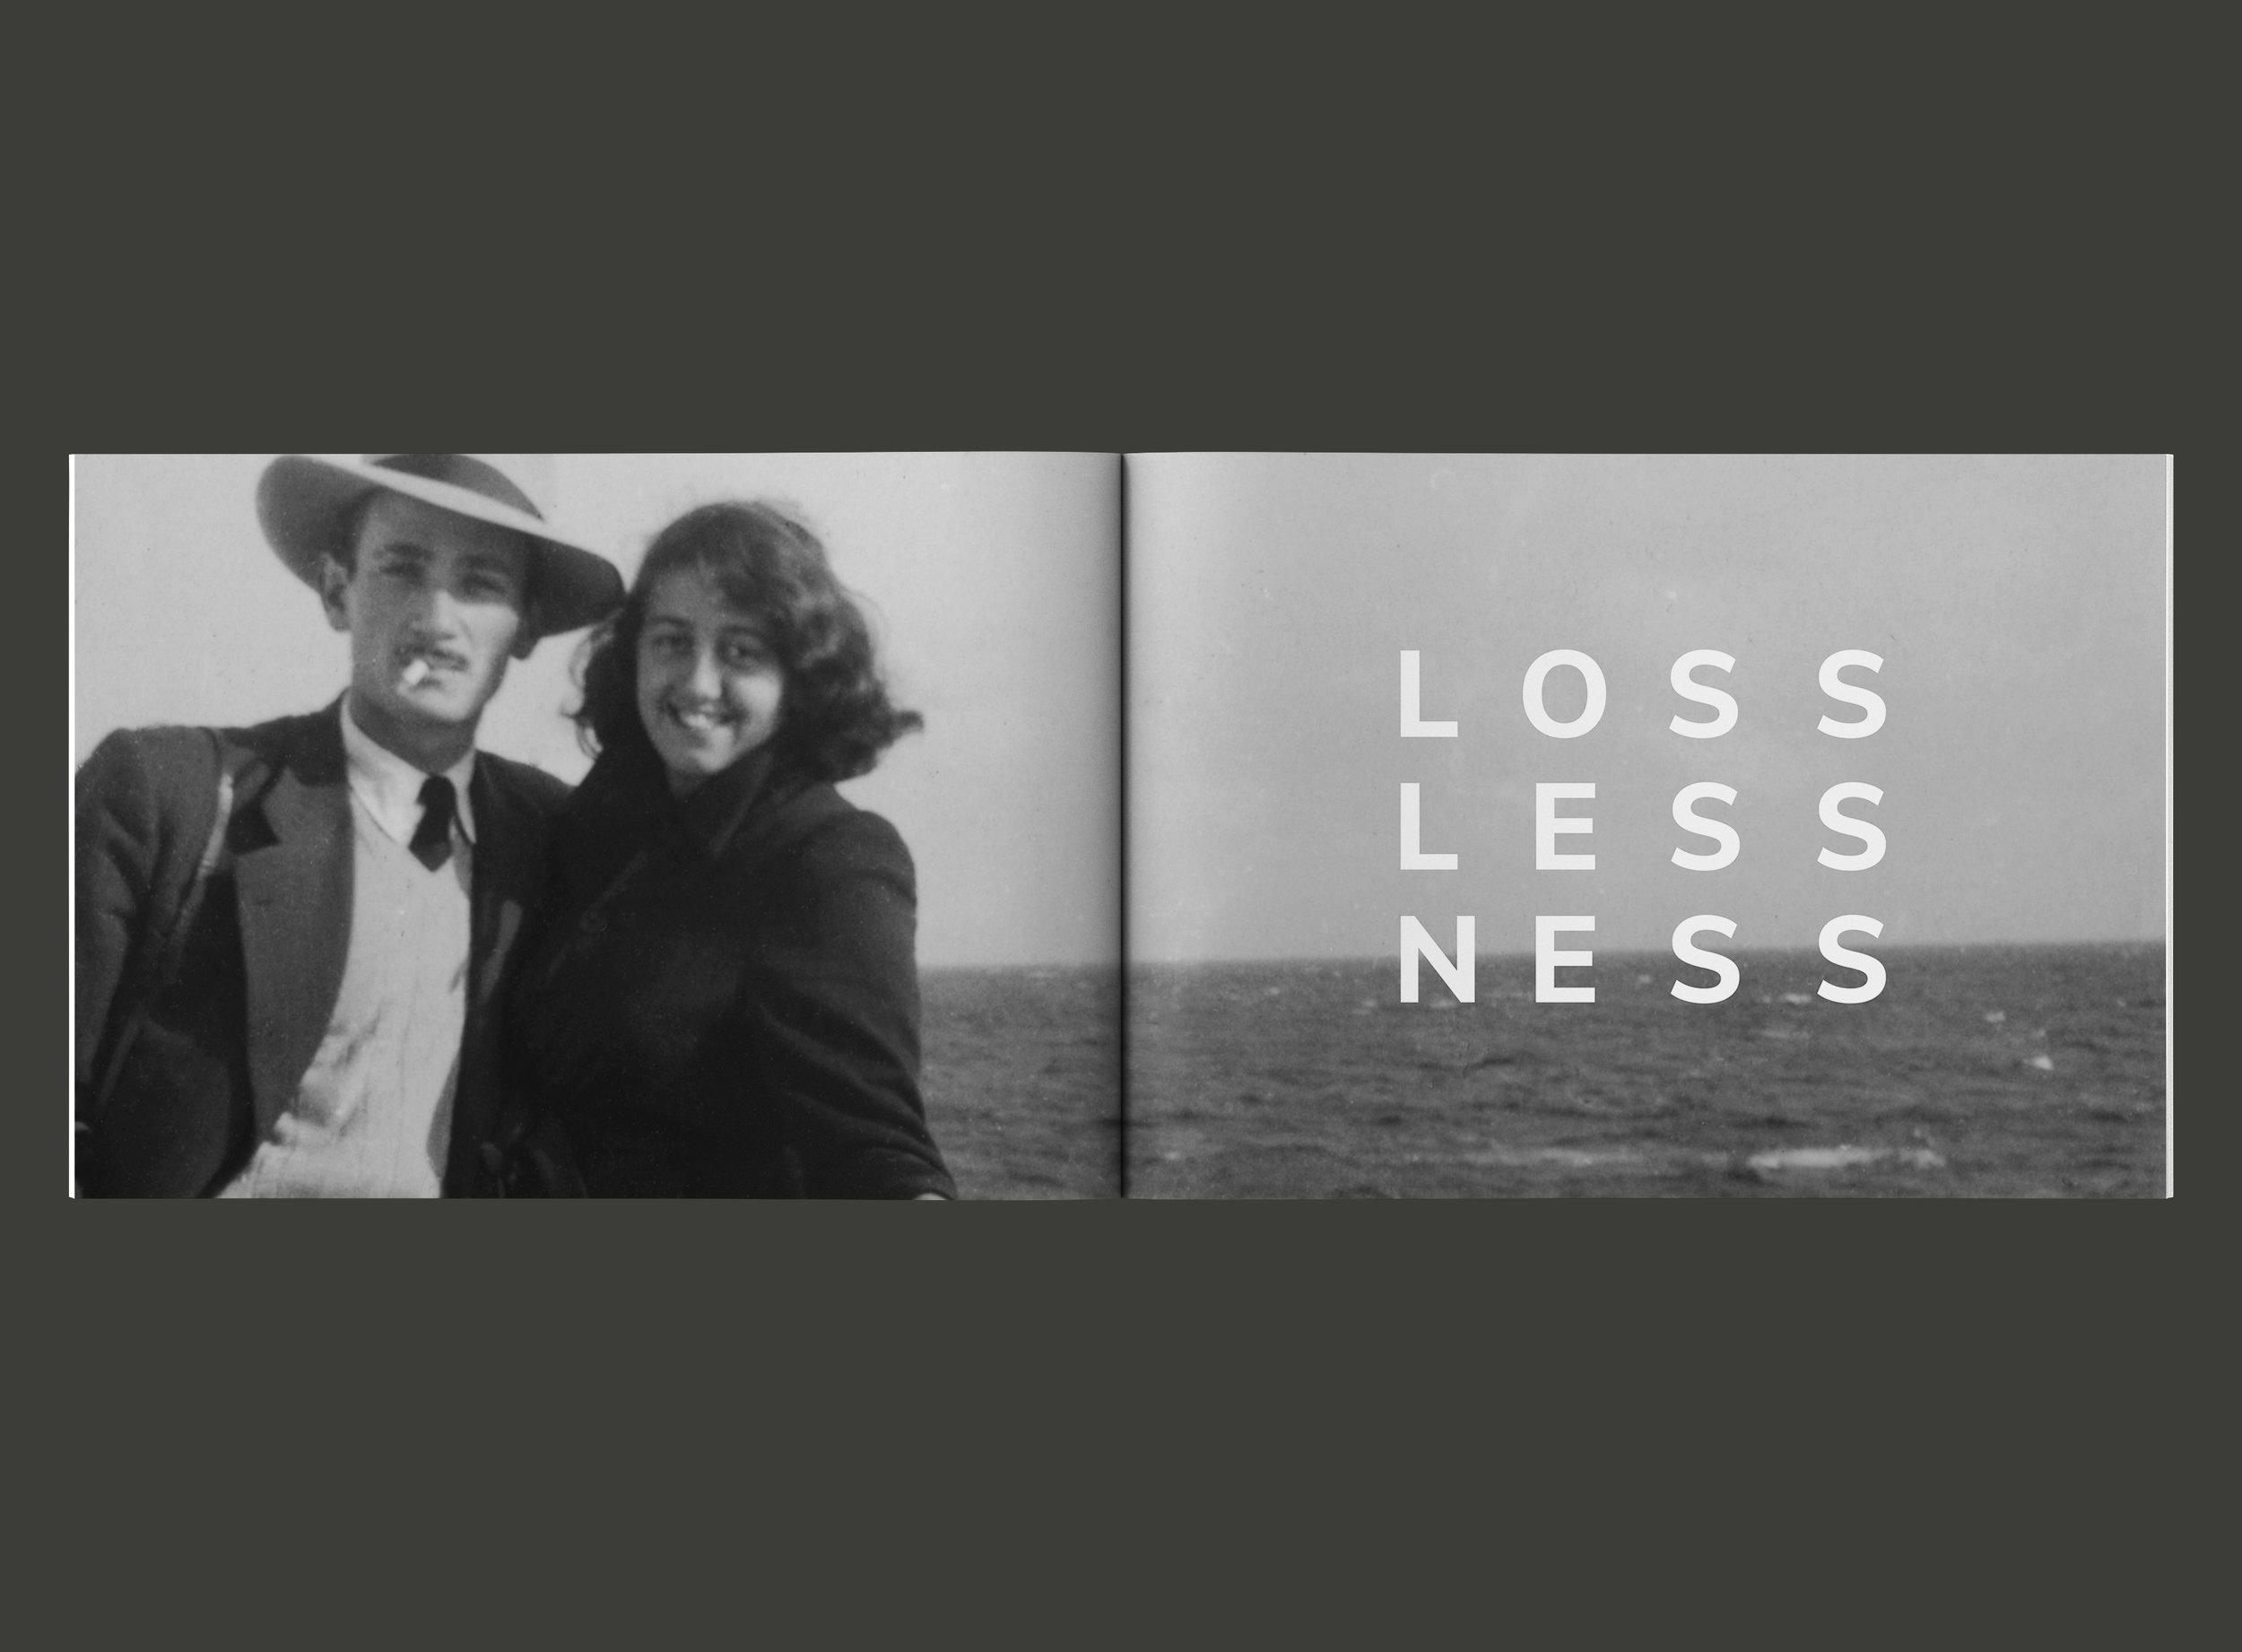 FONN losslessness.jpg